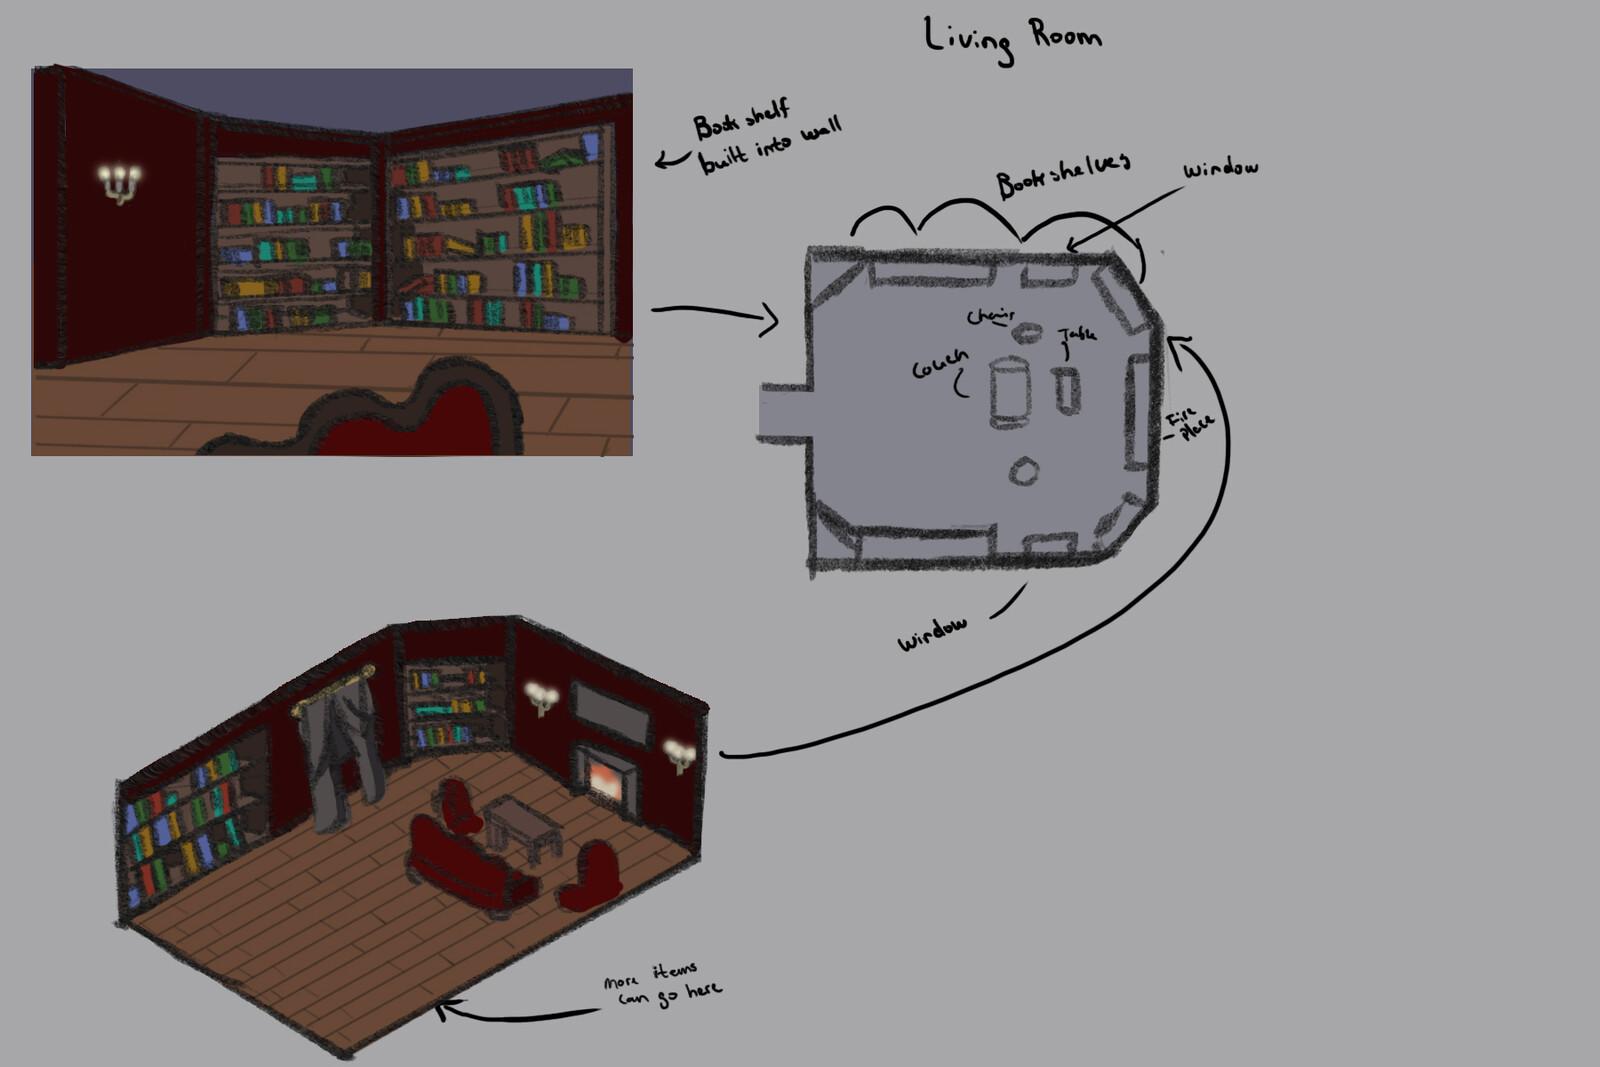 Concept Art: Living Room